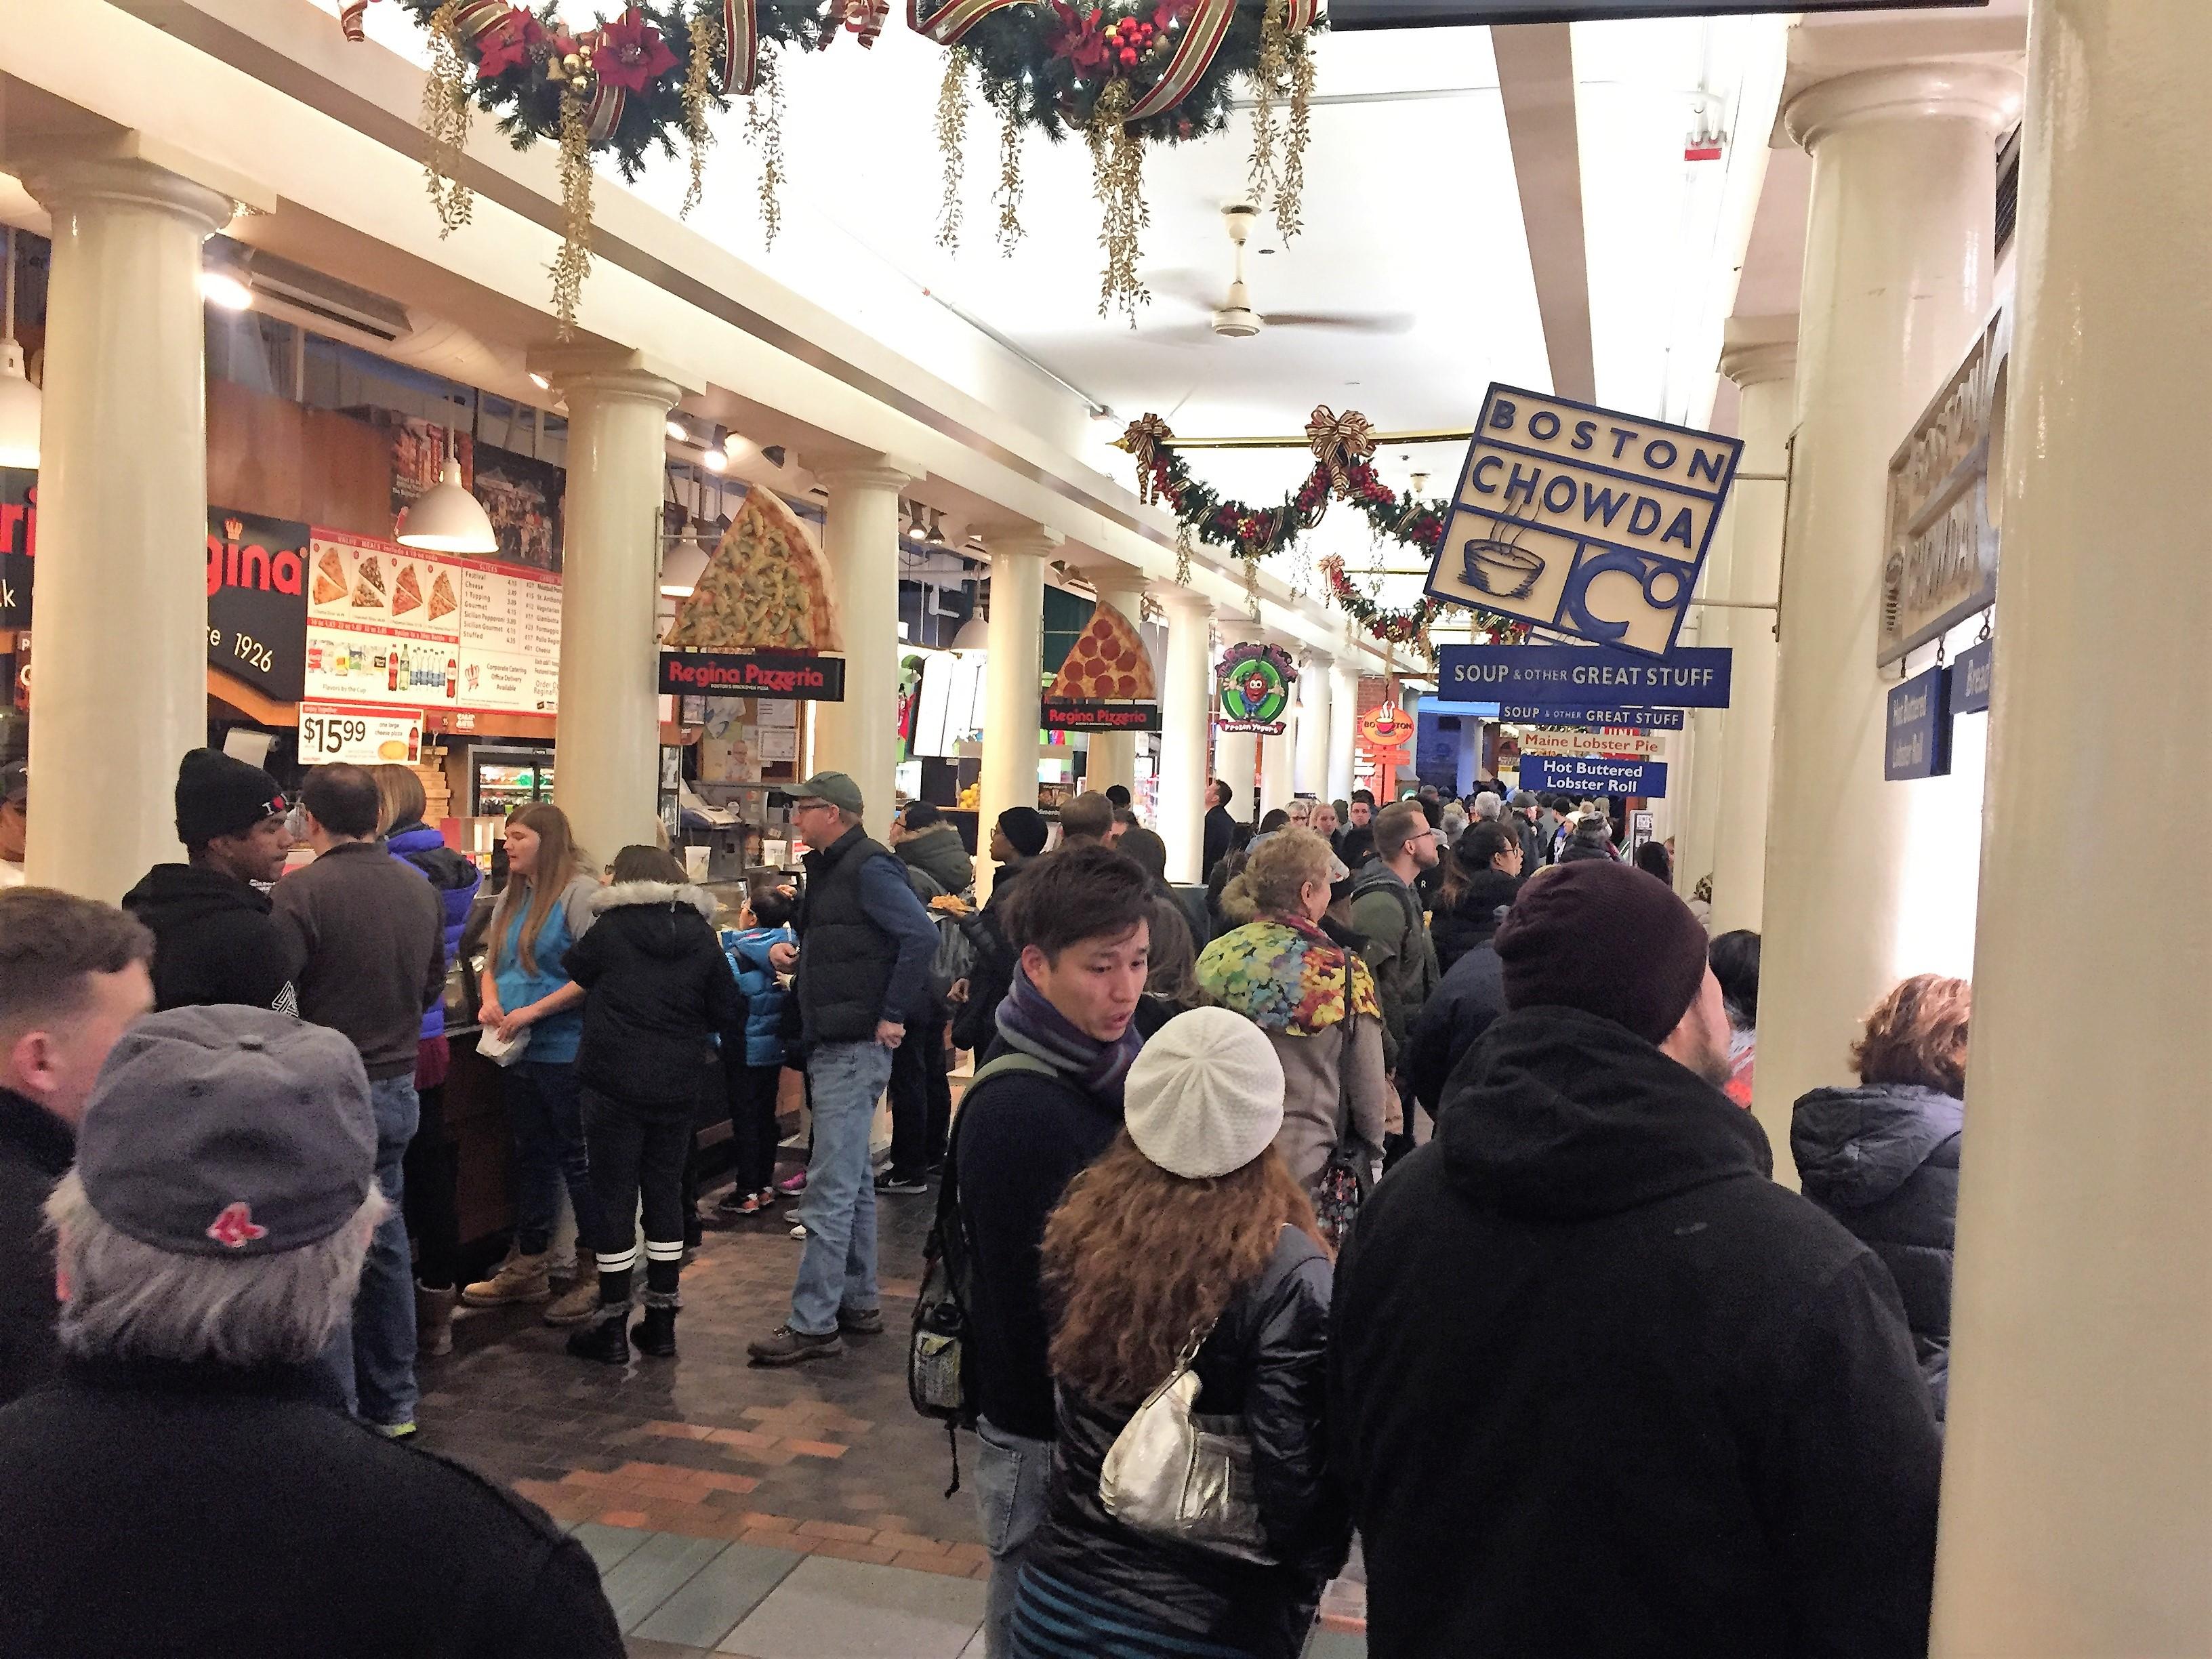 Quincy-Market-Vendors, Boston, Massachusetts, USA